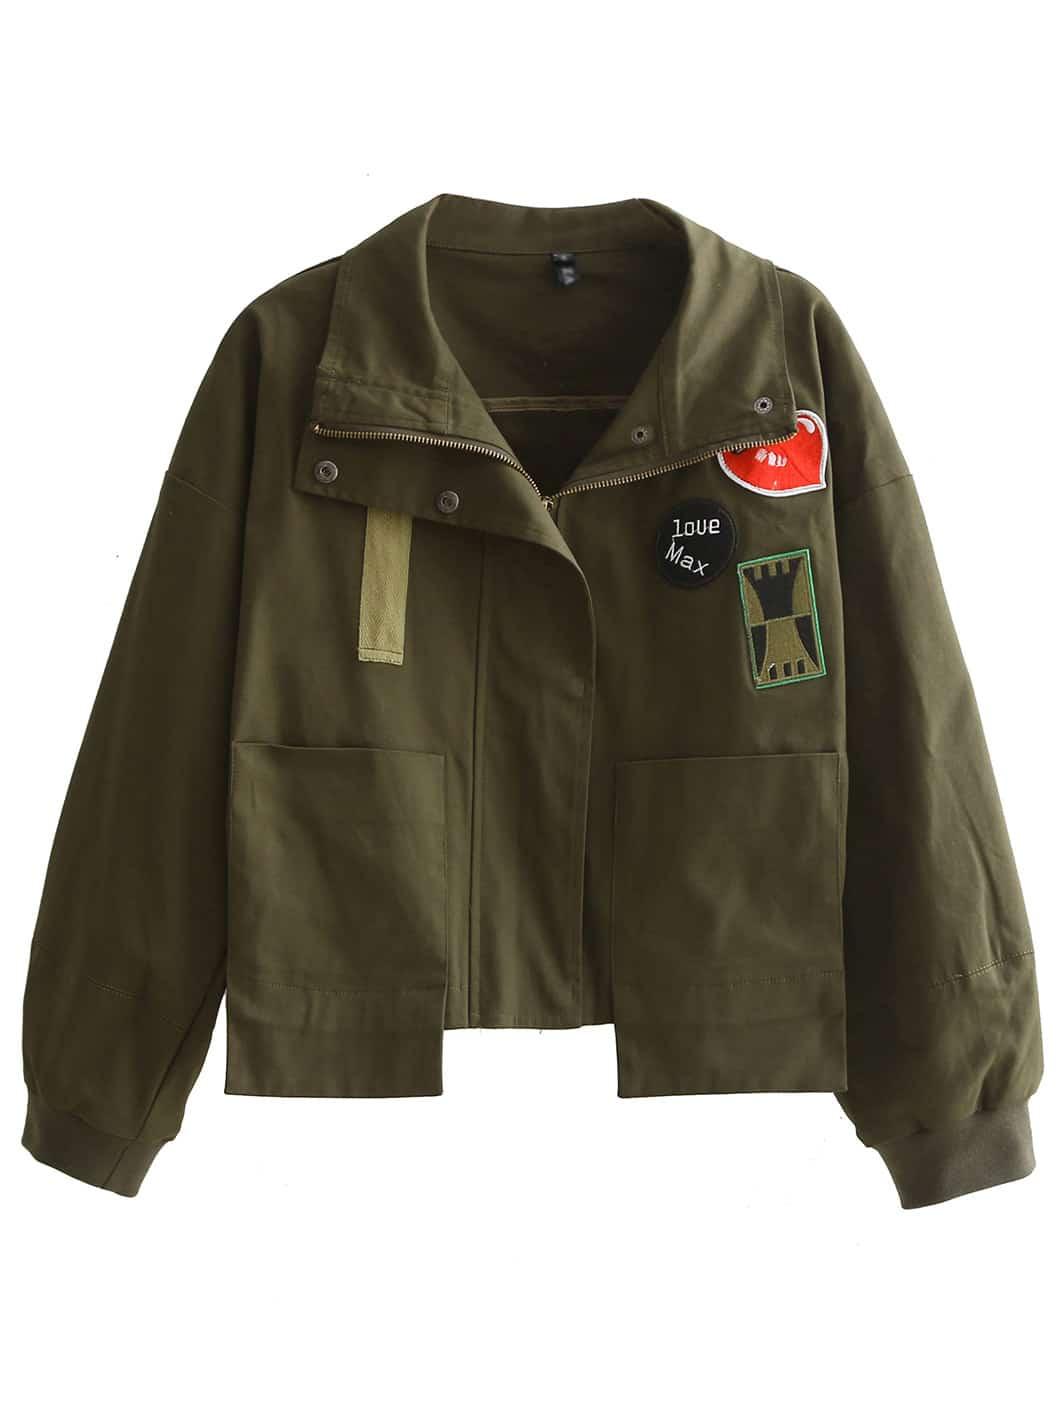 Army Green Zipper Applique Tassel JacketArmy Green Zipper Applique Tassel Jacket<br><br>color: Red<br>size: L,M,S